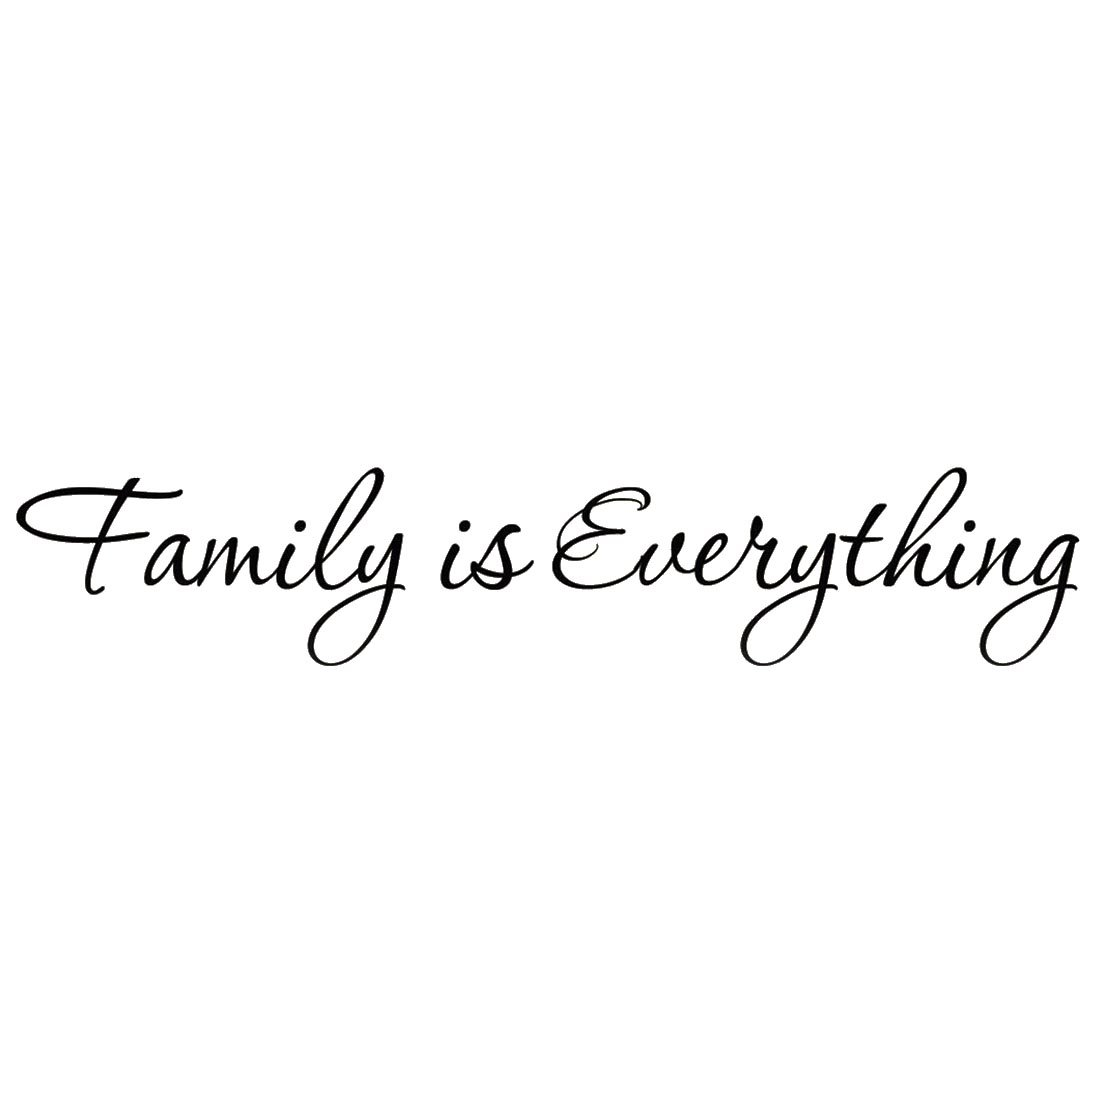 Family Is Everything Forever: Innovative Stencils 1225 Mblack Family Is Forever Vinyl